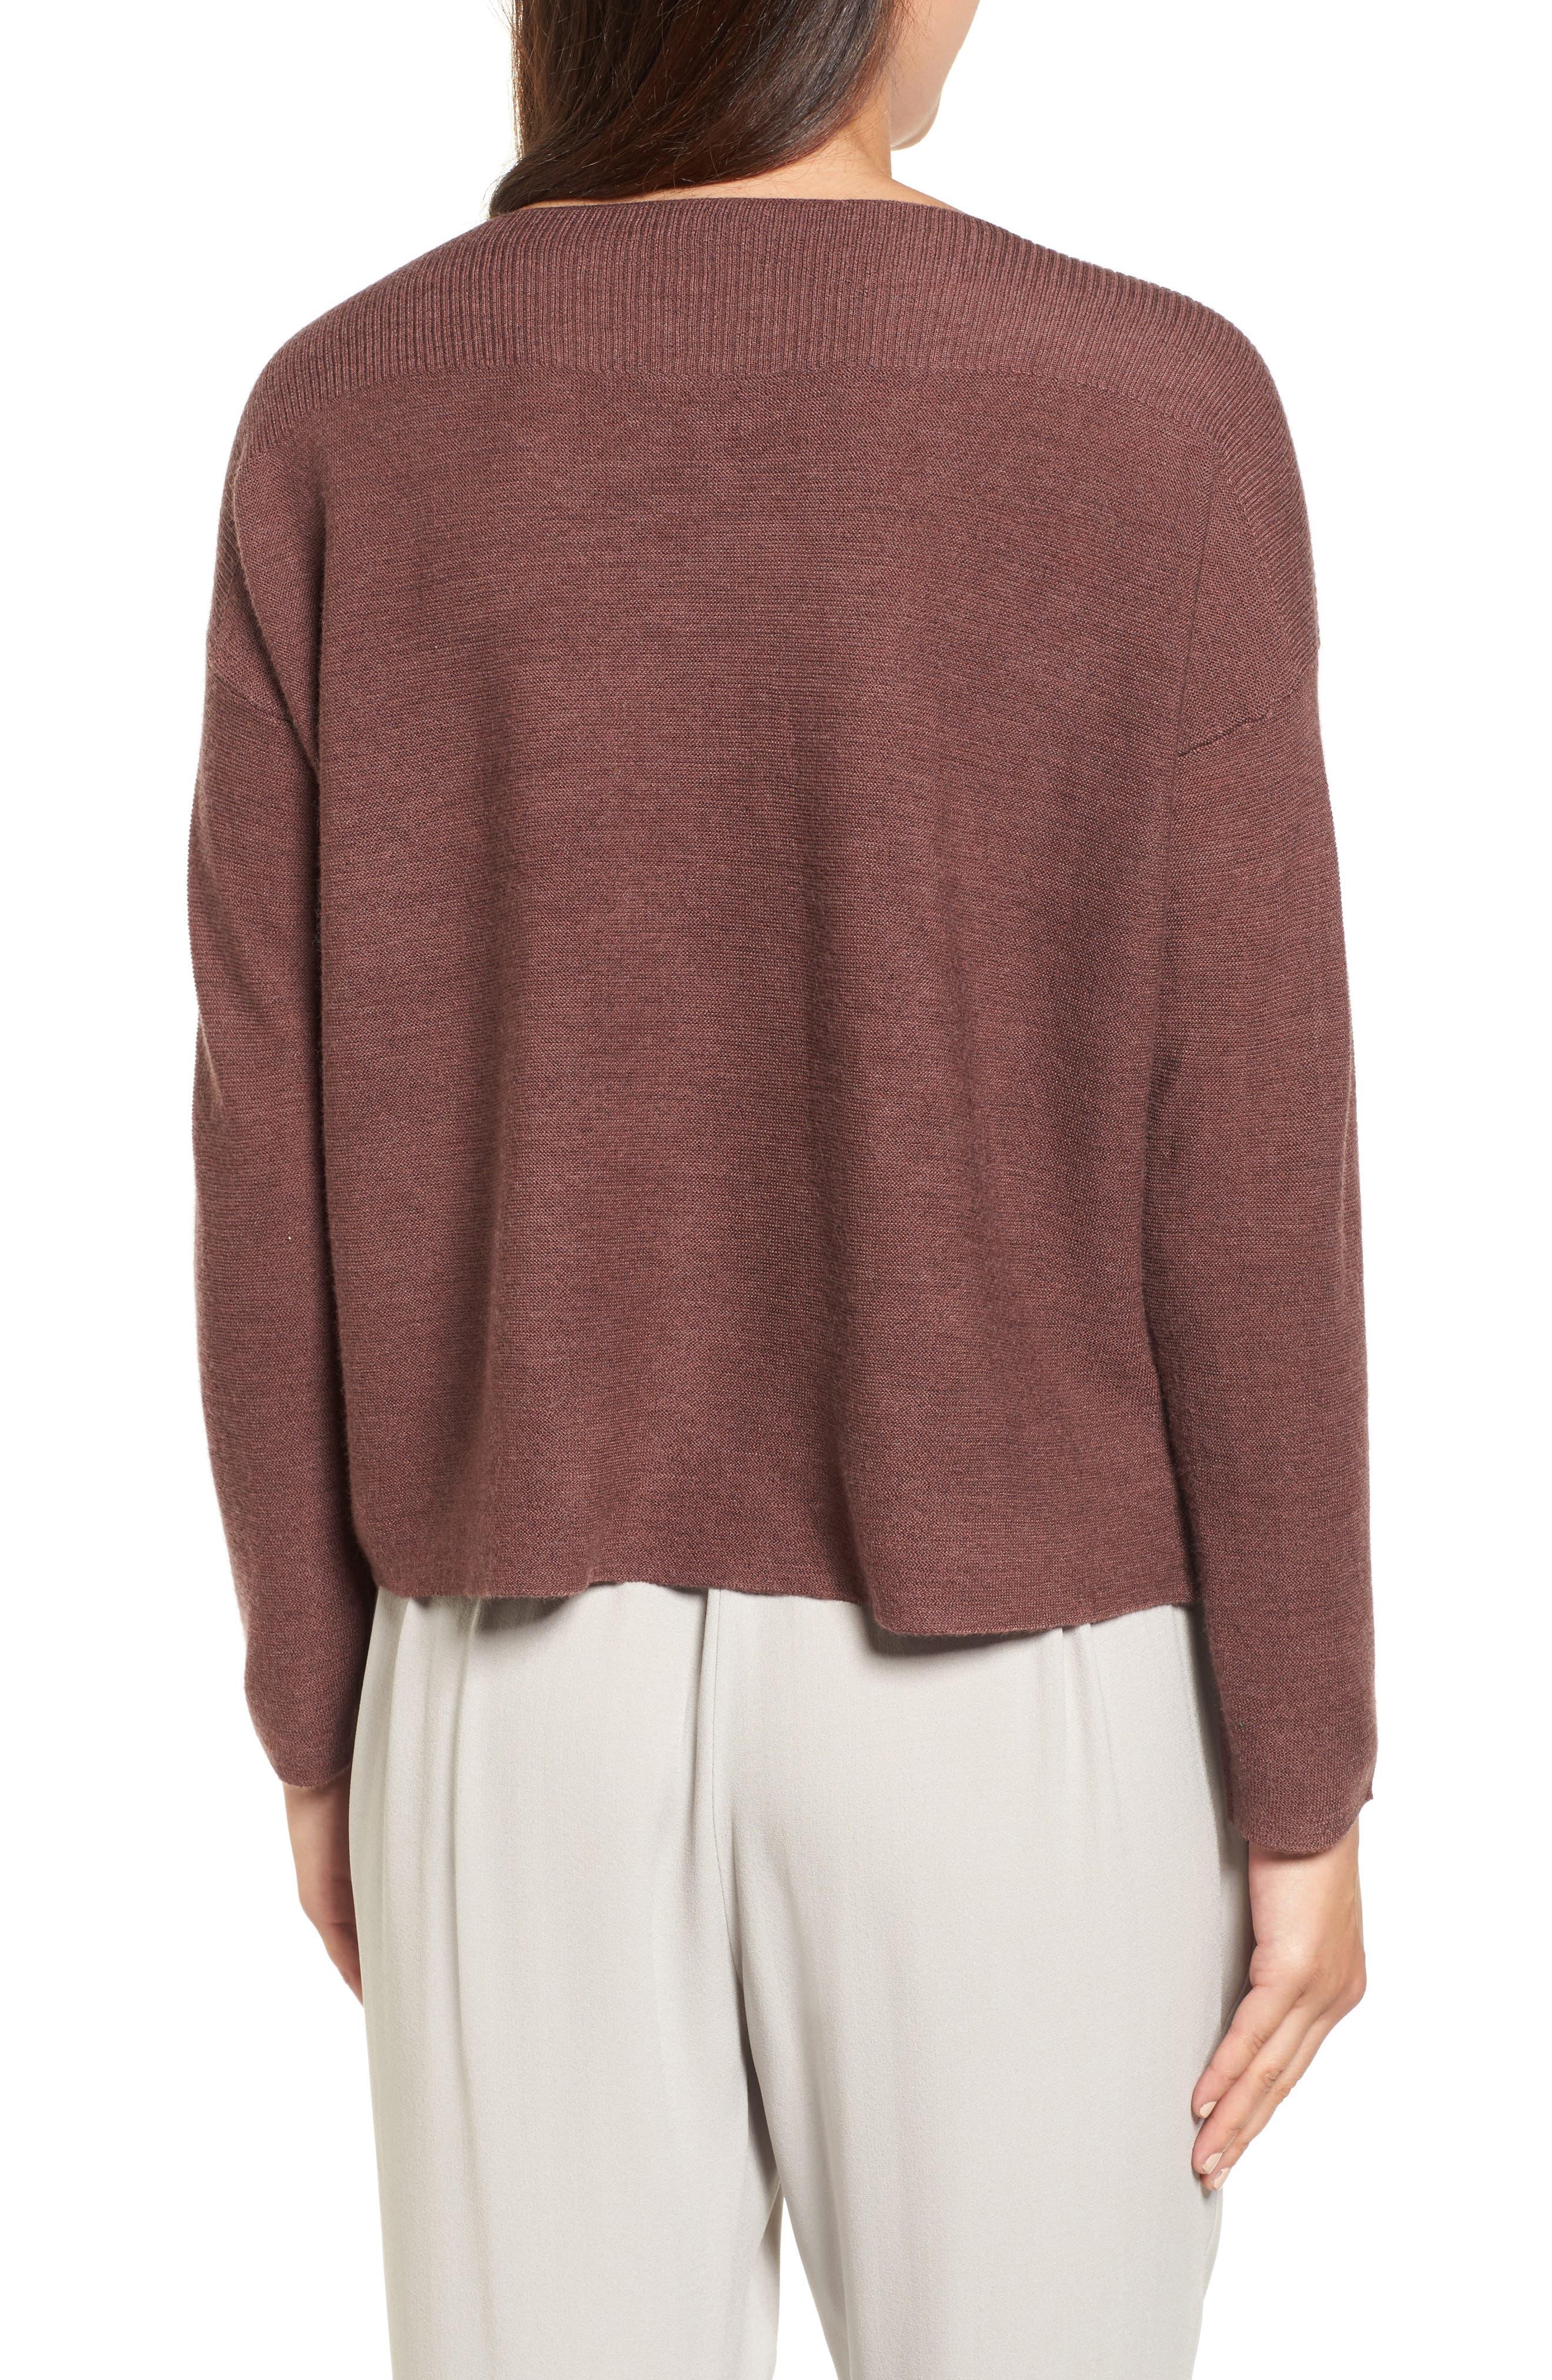 Mix Stitch Merino Bateau Neck Sweater,                             Alternate thumbnail 2, color,                             216